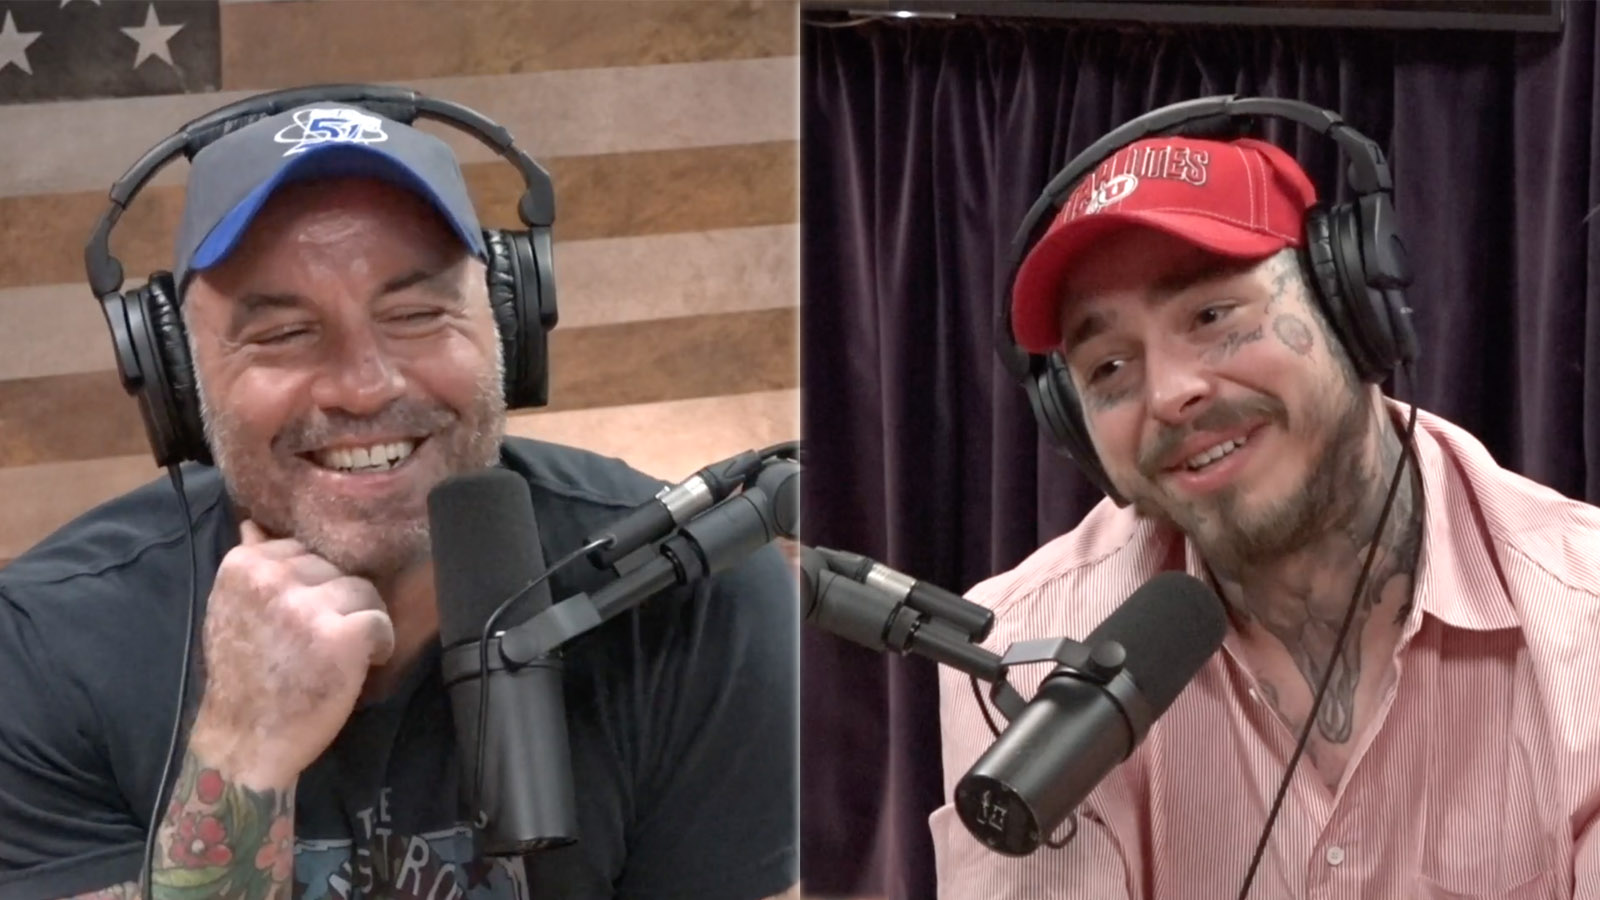 Joe Rogan and Post Malone on a podcast